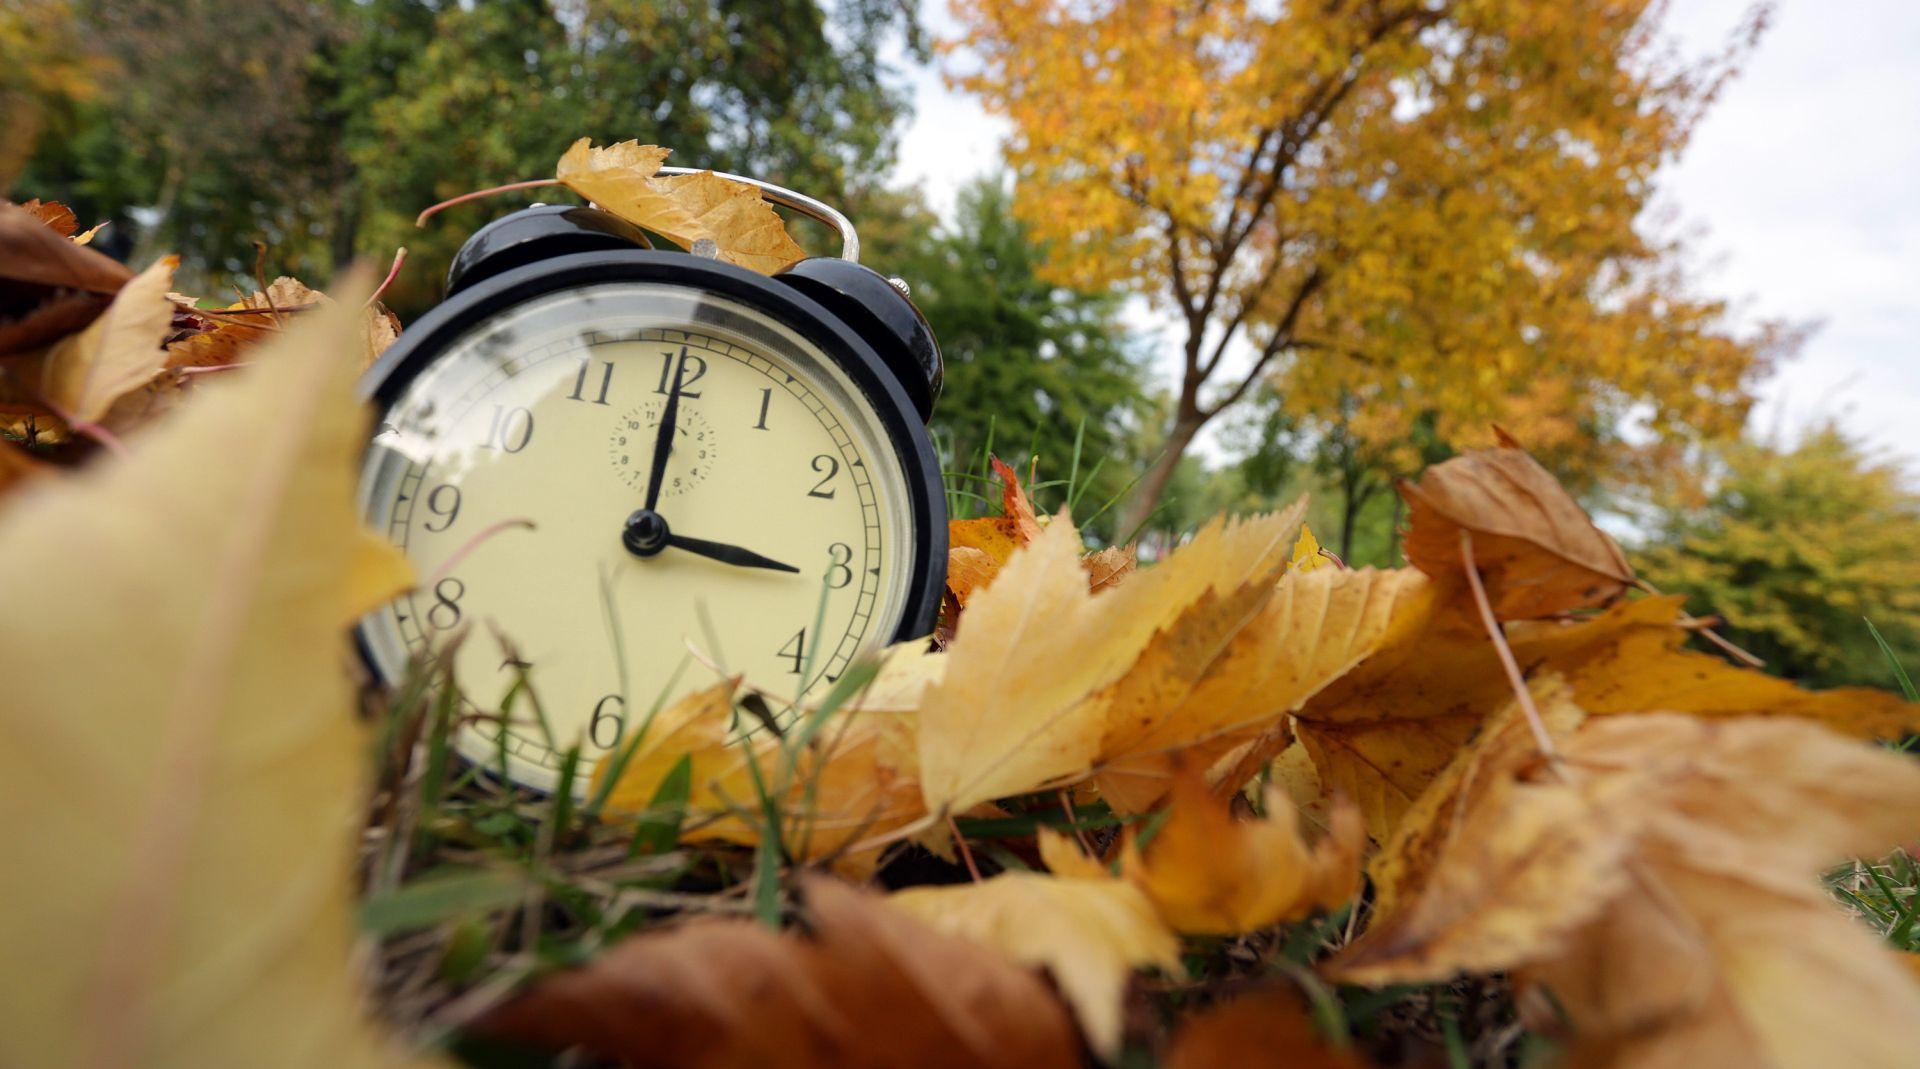 PROMETNA PRAVILA, PROMJENE U ORGANIZMU, NOVE TARIFE Prelazak na zimsko računanje vremena